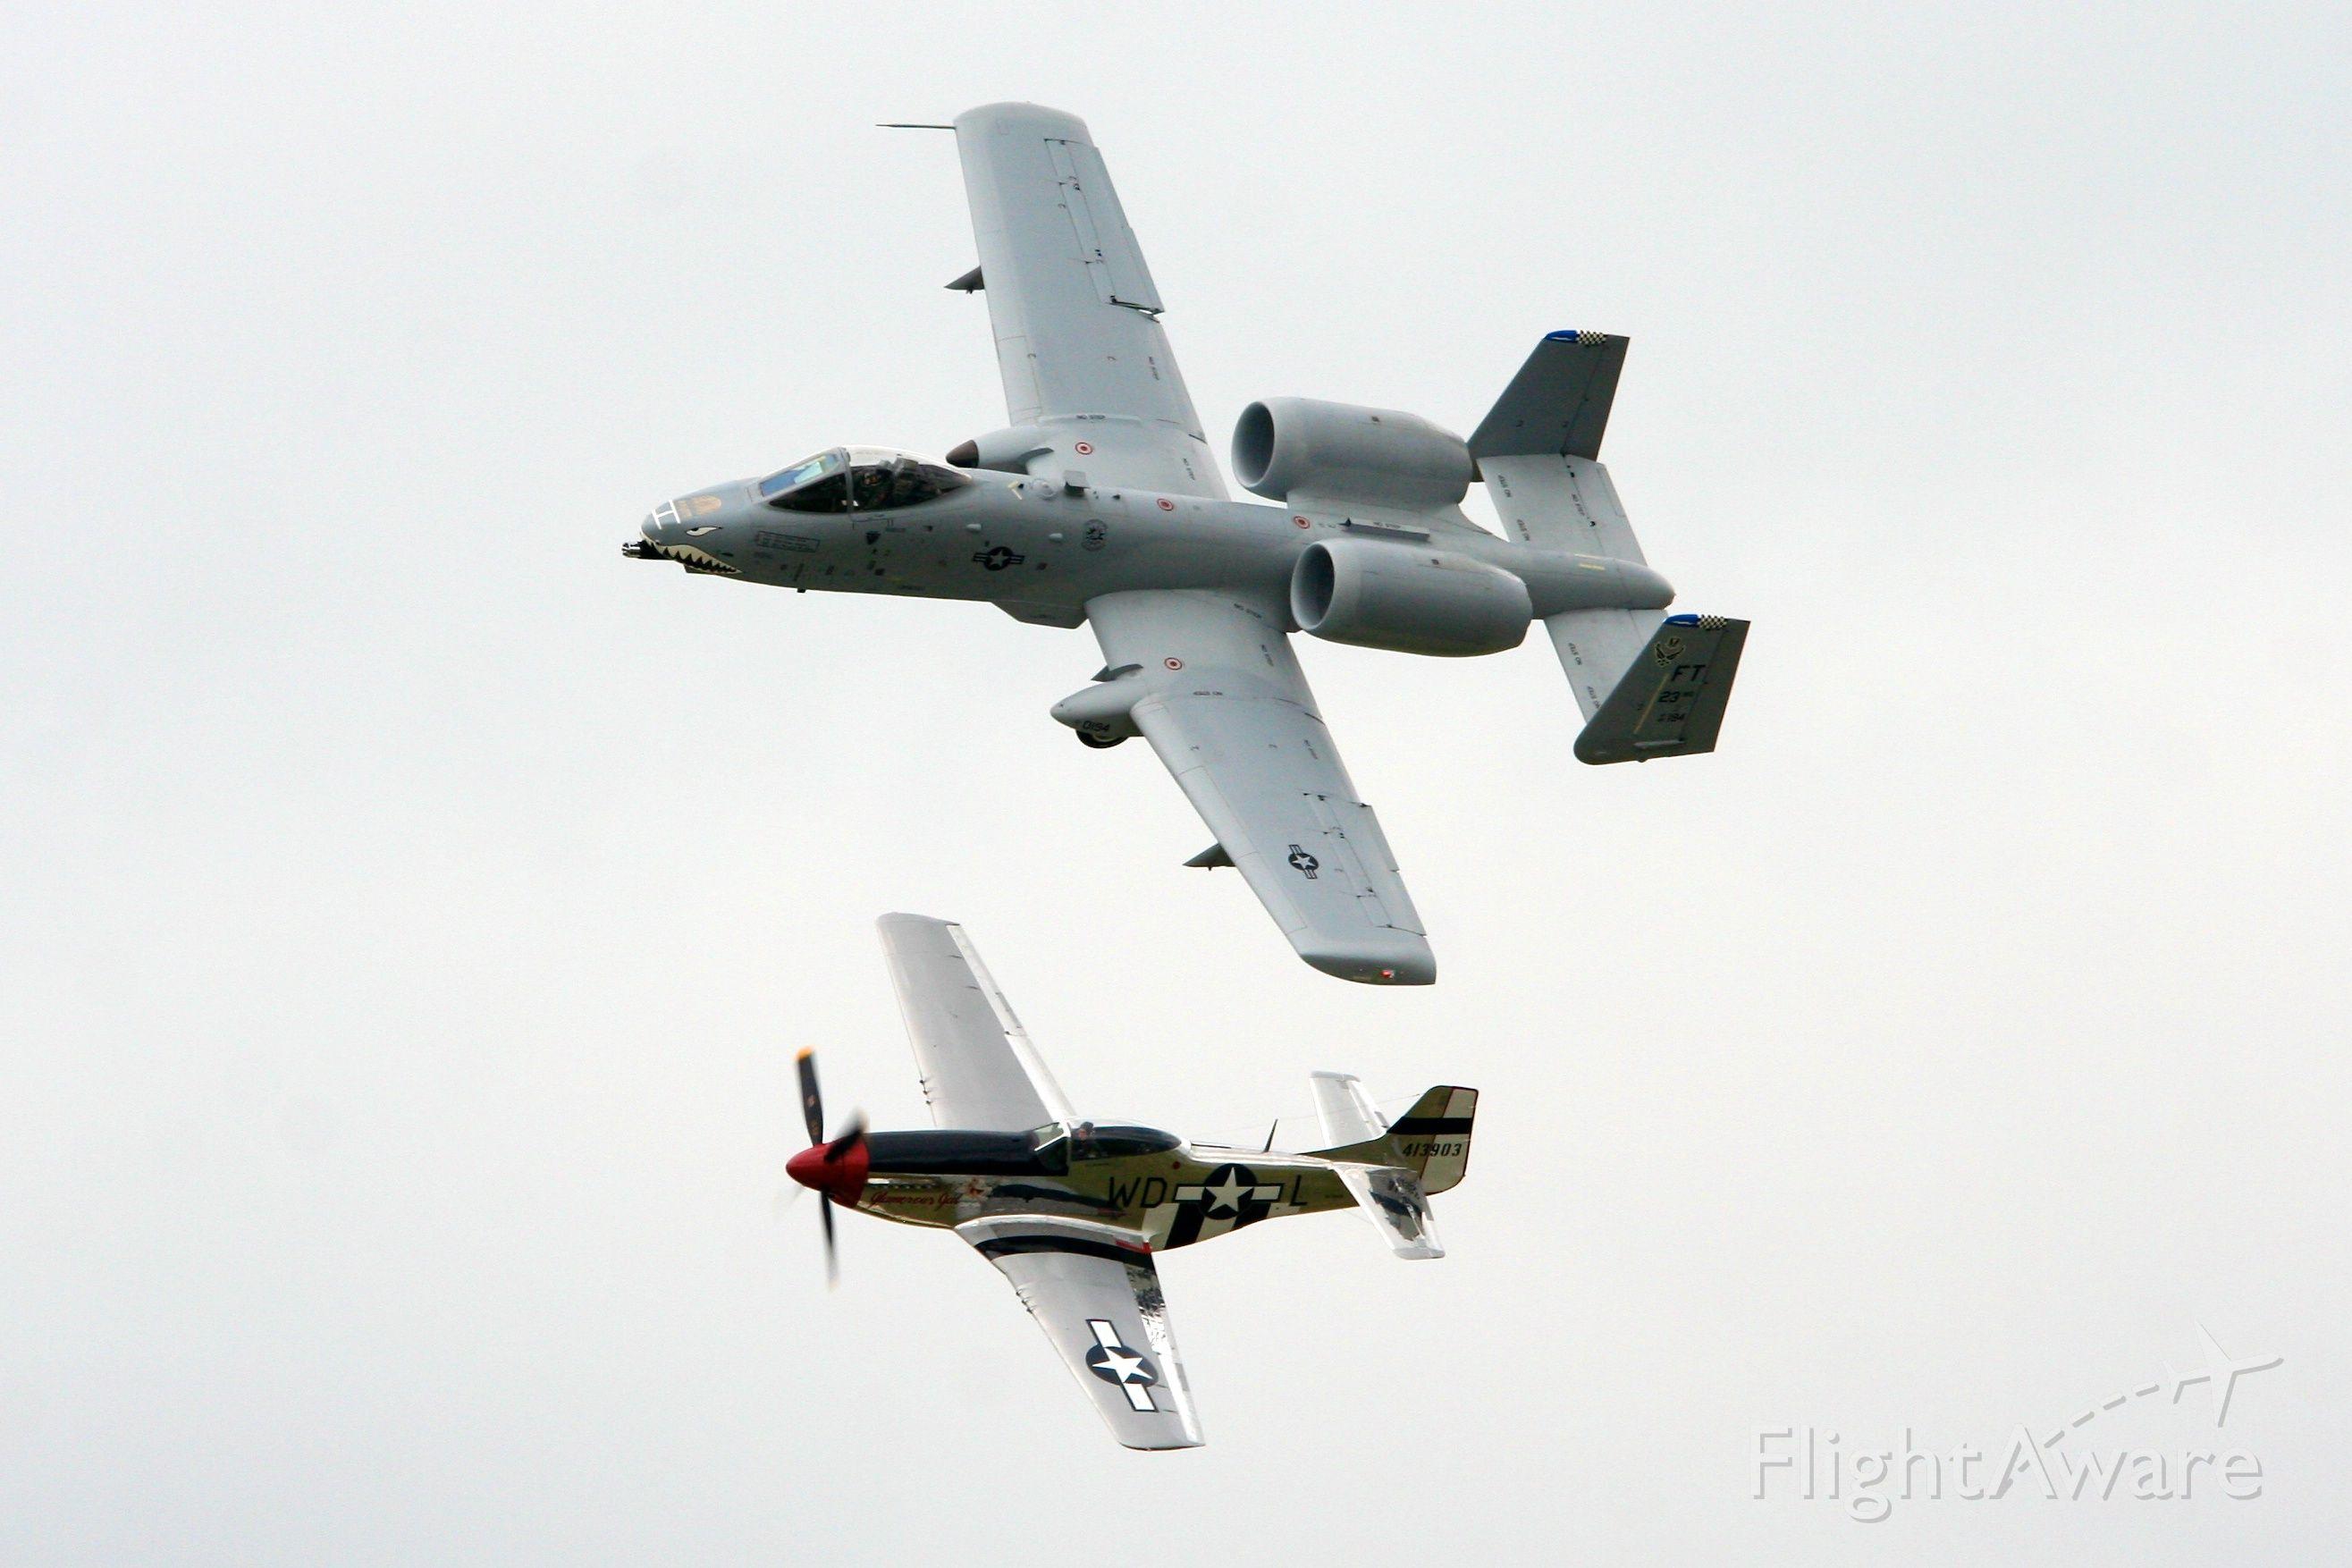 — — - A10 P51 Heritage Flight - Dayton Airshow 2009